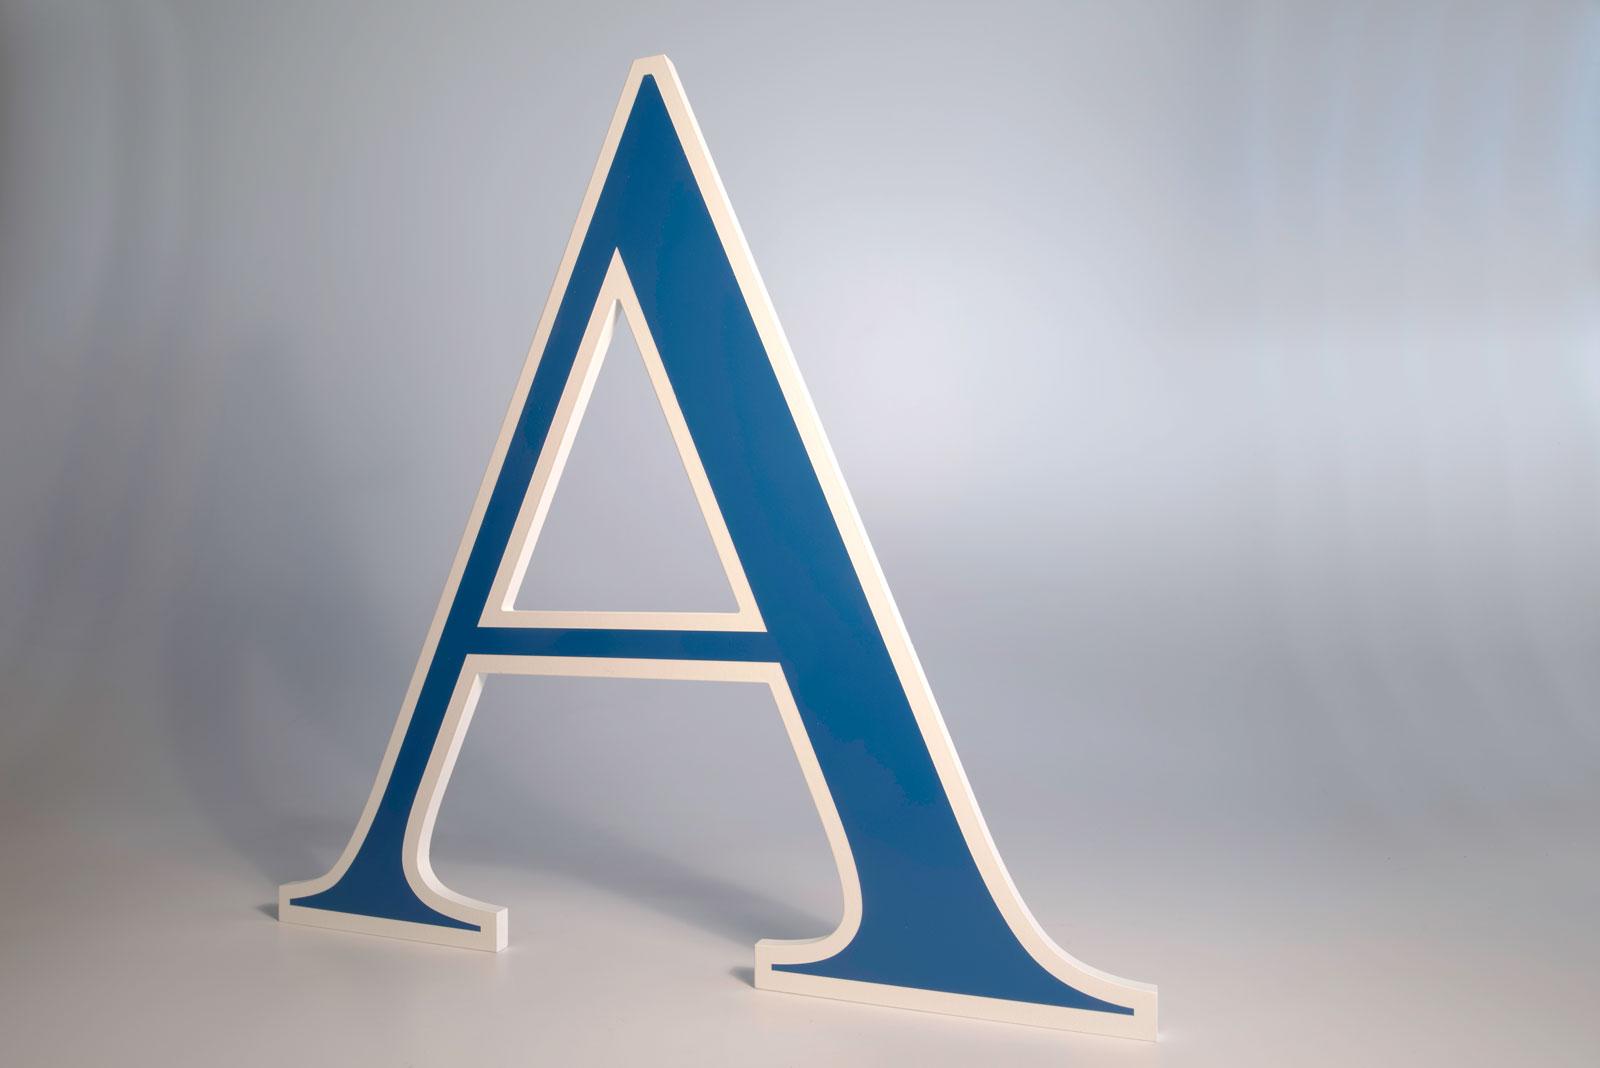 Dimensional-Letter-A.jpg